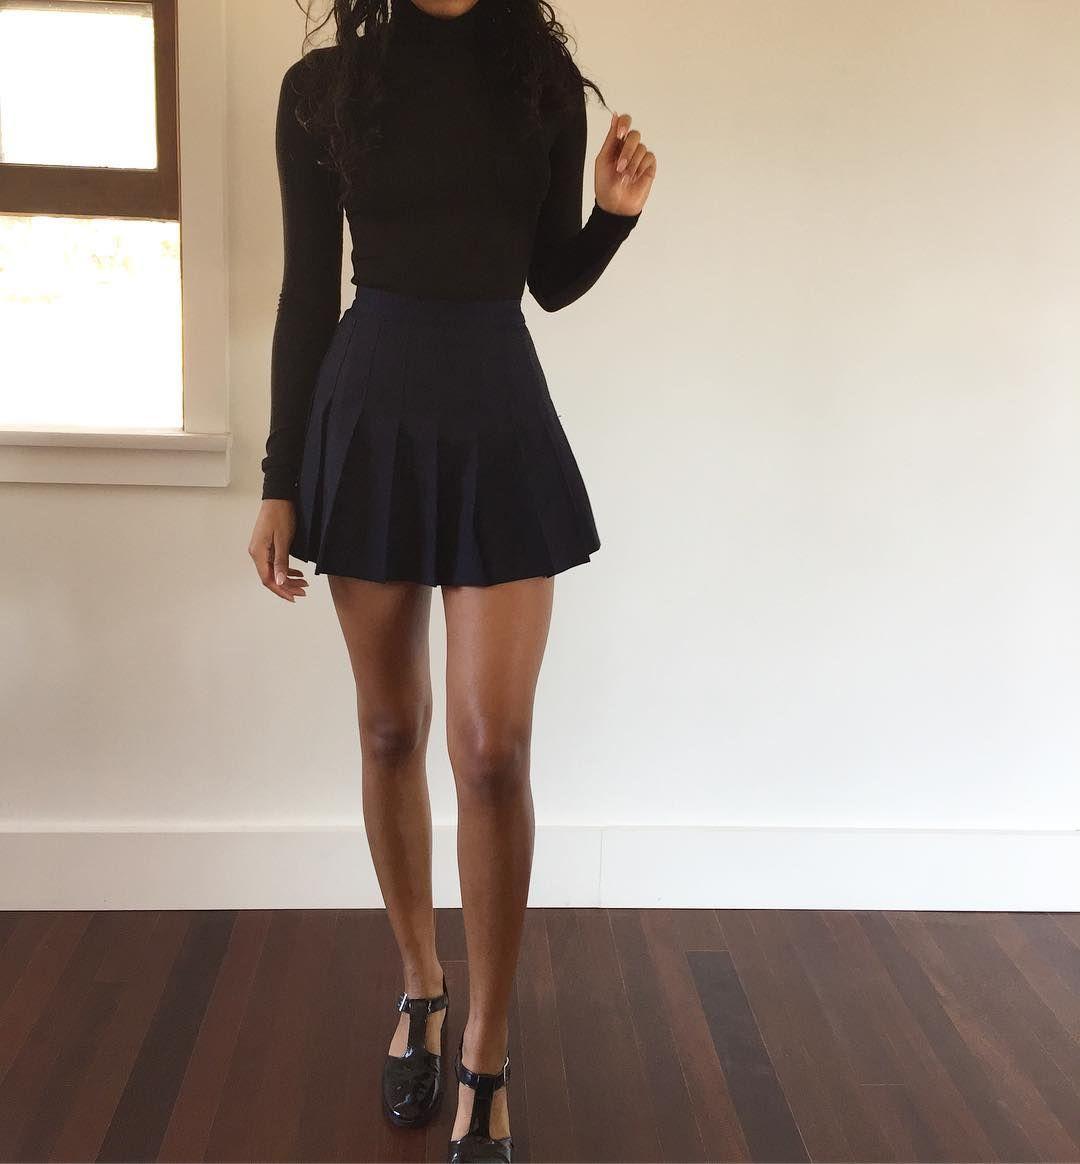 American Apparel Tennis Skirt In Black Size Large American Apparel Tennis Skirt Tennis Skirt Outfit American Apparel Skirt